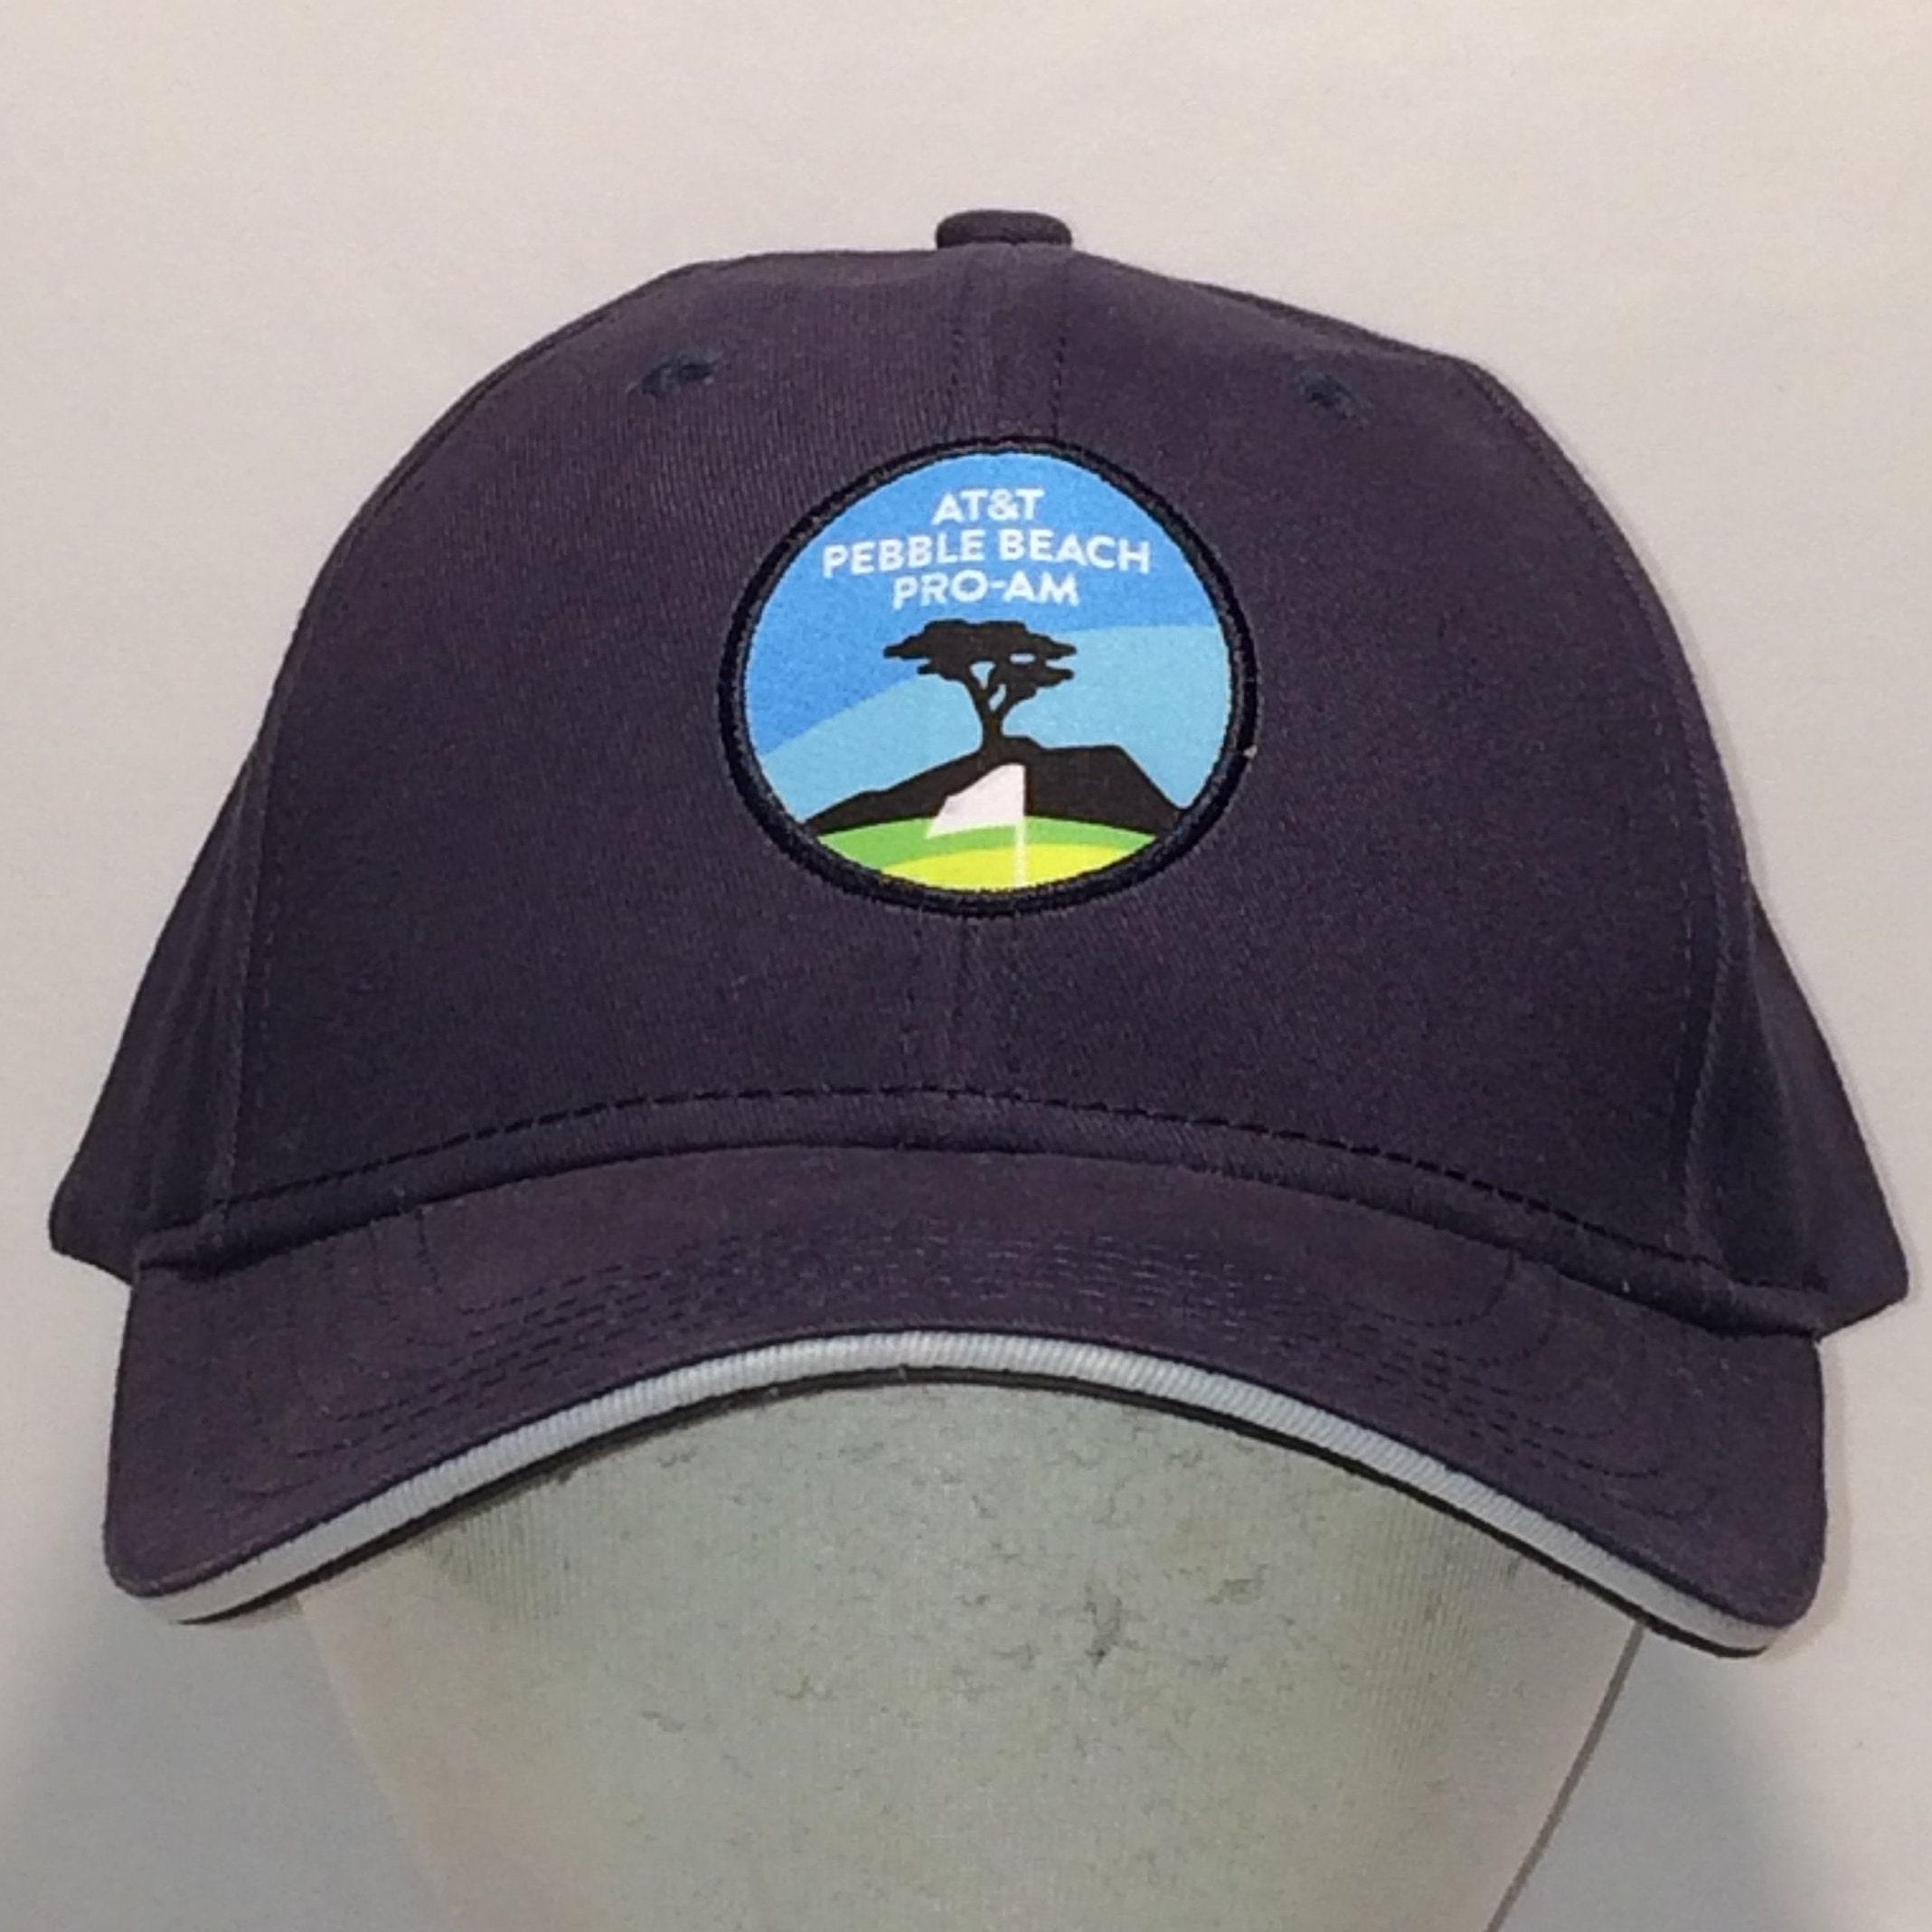 e857b46a4 Vintage Golf Hats For Men Baseball Cap ATT Pebble Beach Pro Am Strapback  Hat Navy Blue Cotton Ball Cap Golfing Cap Sports Dad Hat T44 MA8009